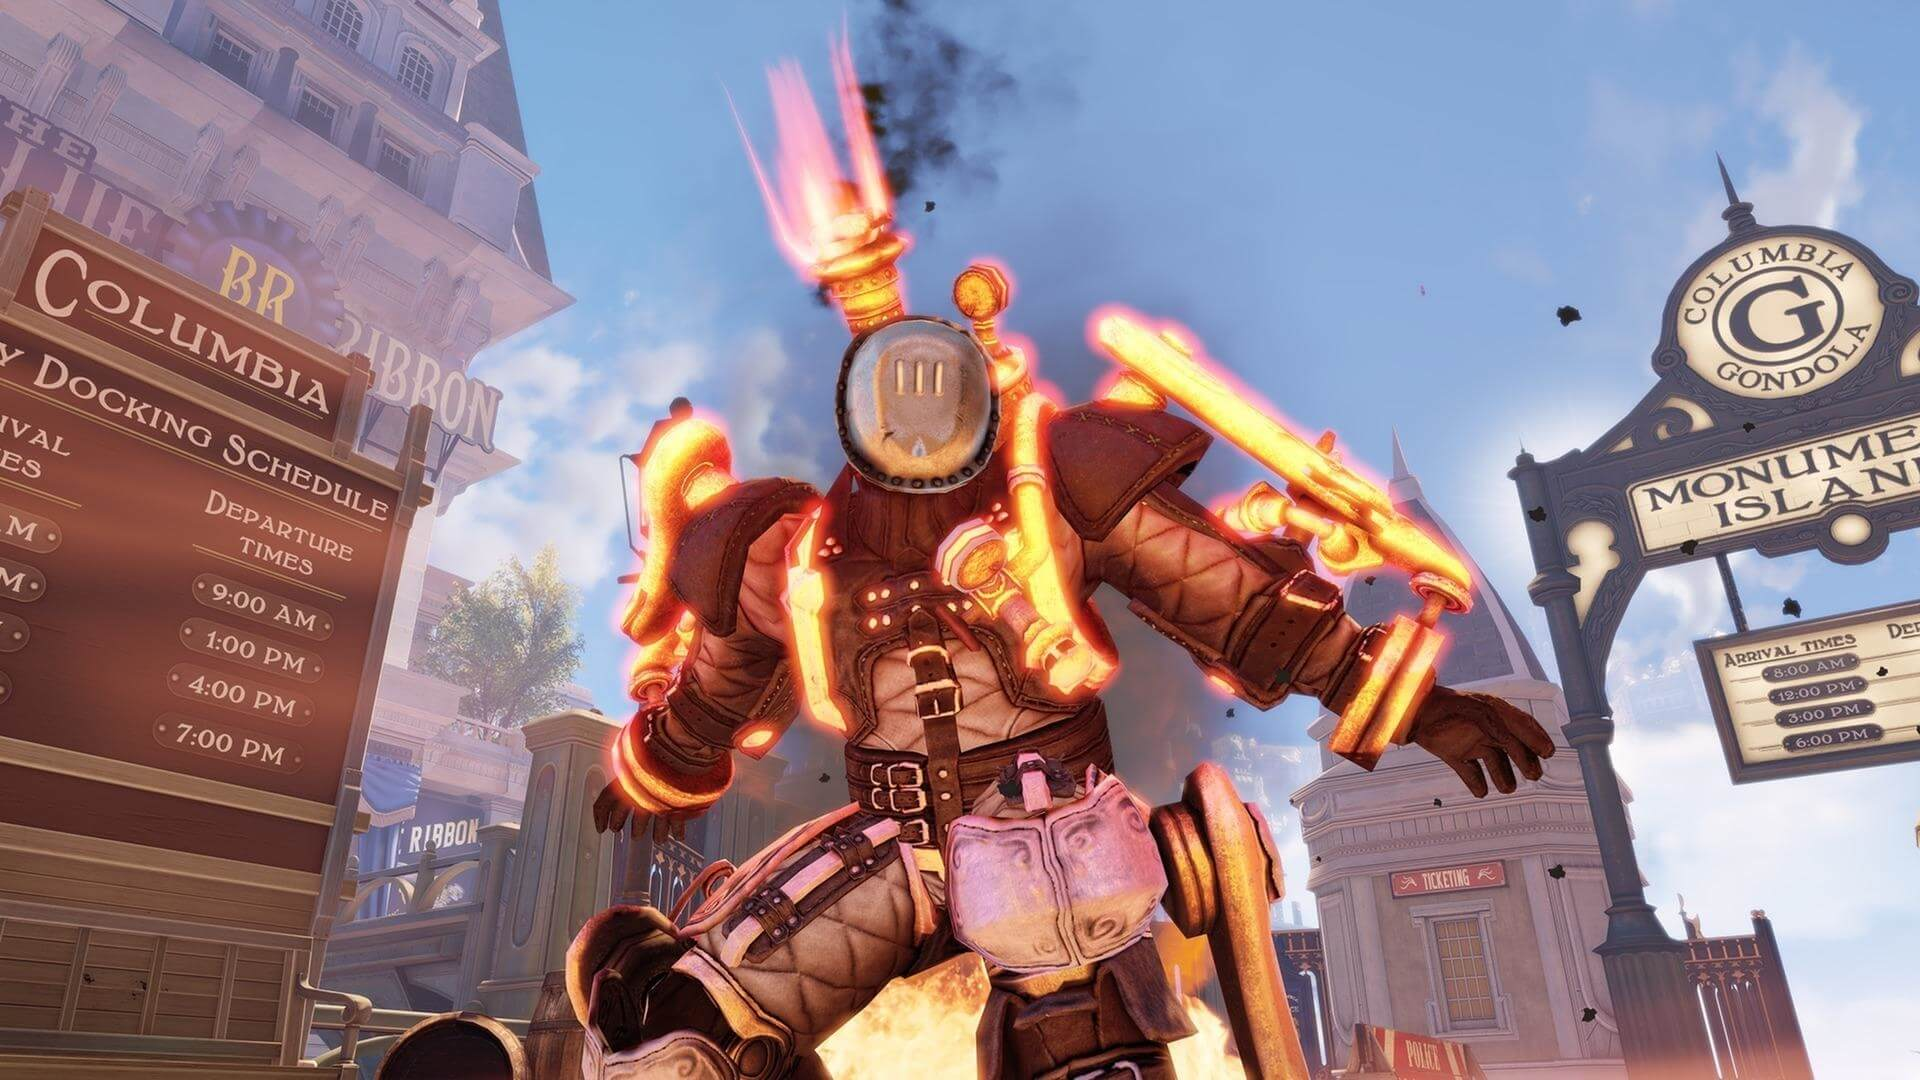 BioShock Infinite : Columbia's Finest (WW)